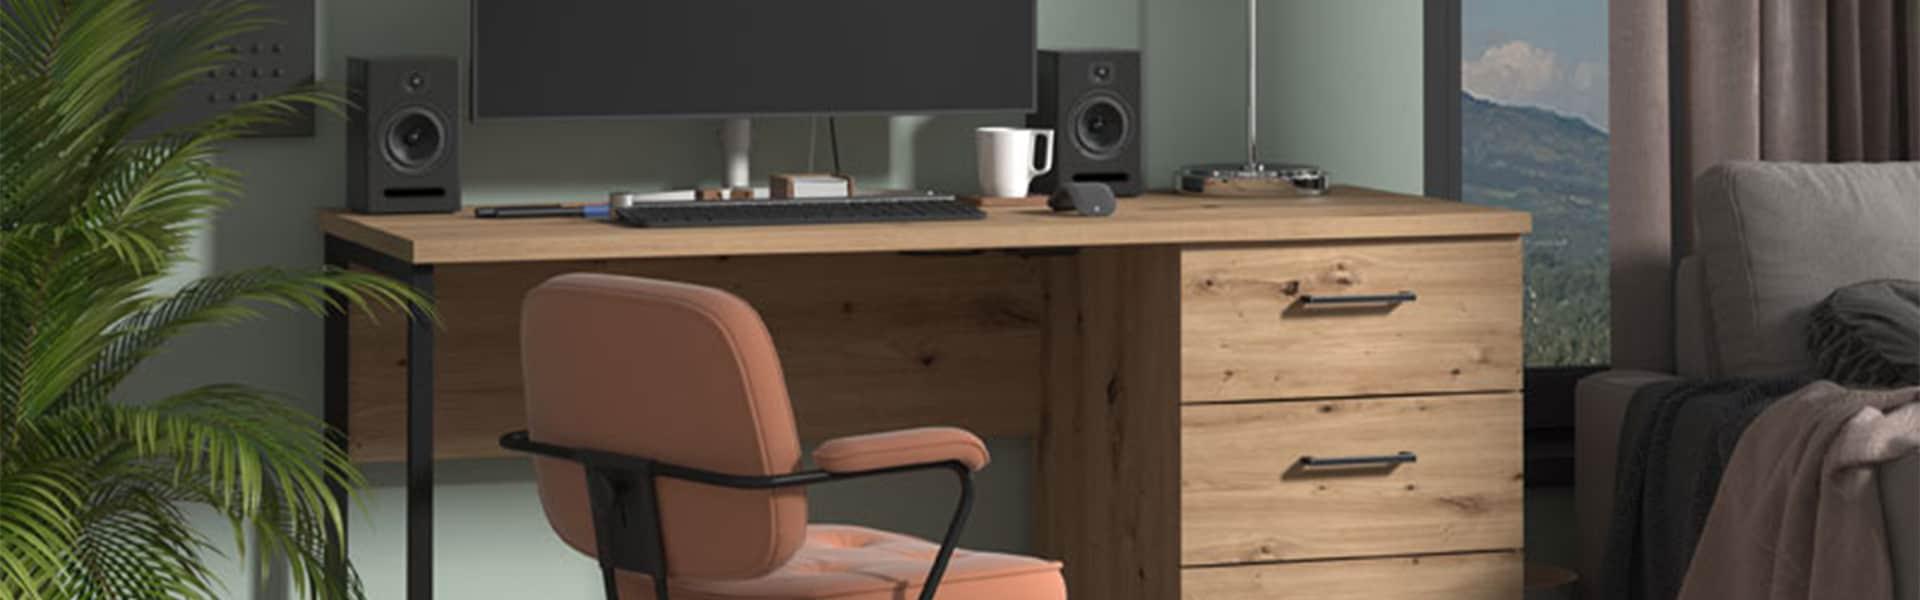 Computer Desk - Computer Stand - Back to school - MDF - Flatpack - Modern - Desk - Stand - Office